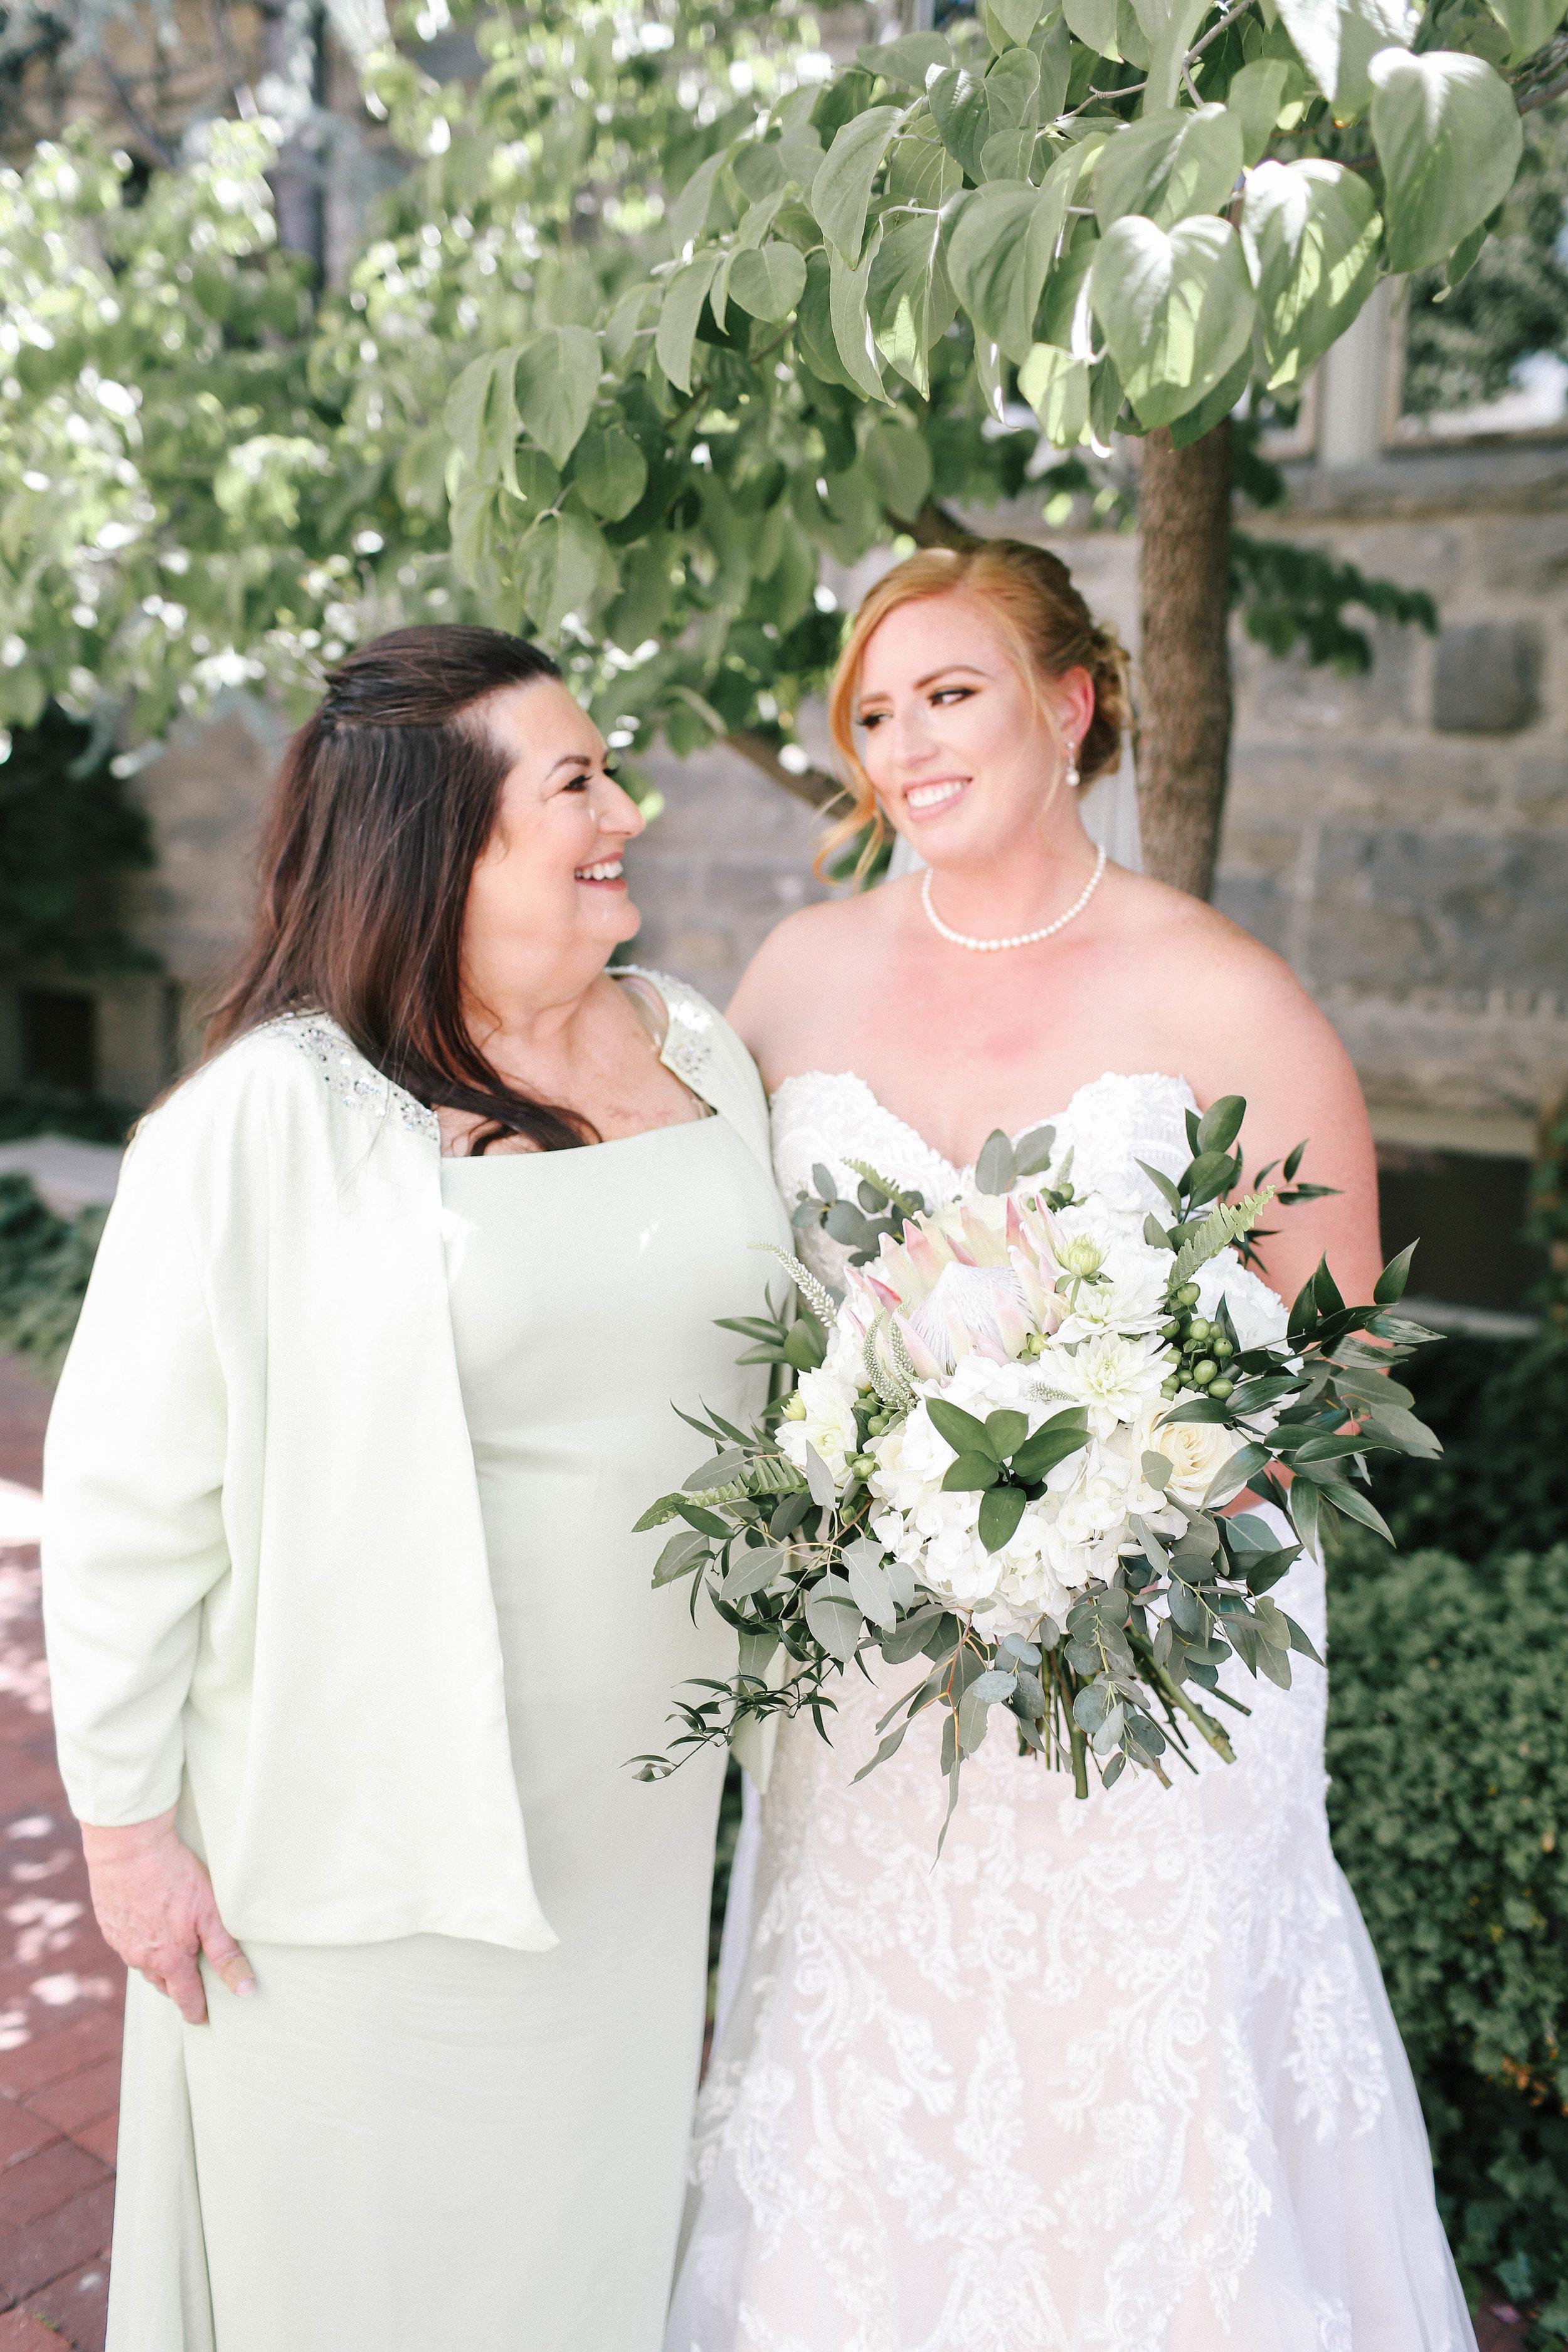 A-Lydia-Rohan-Downtown-Boise-Wedding-21.jpg